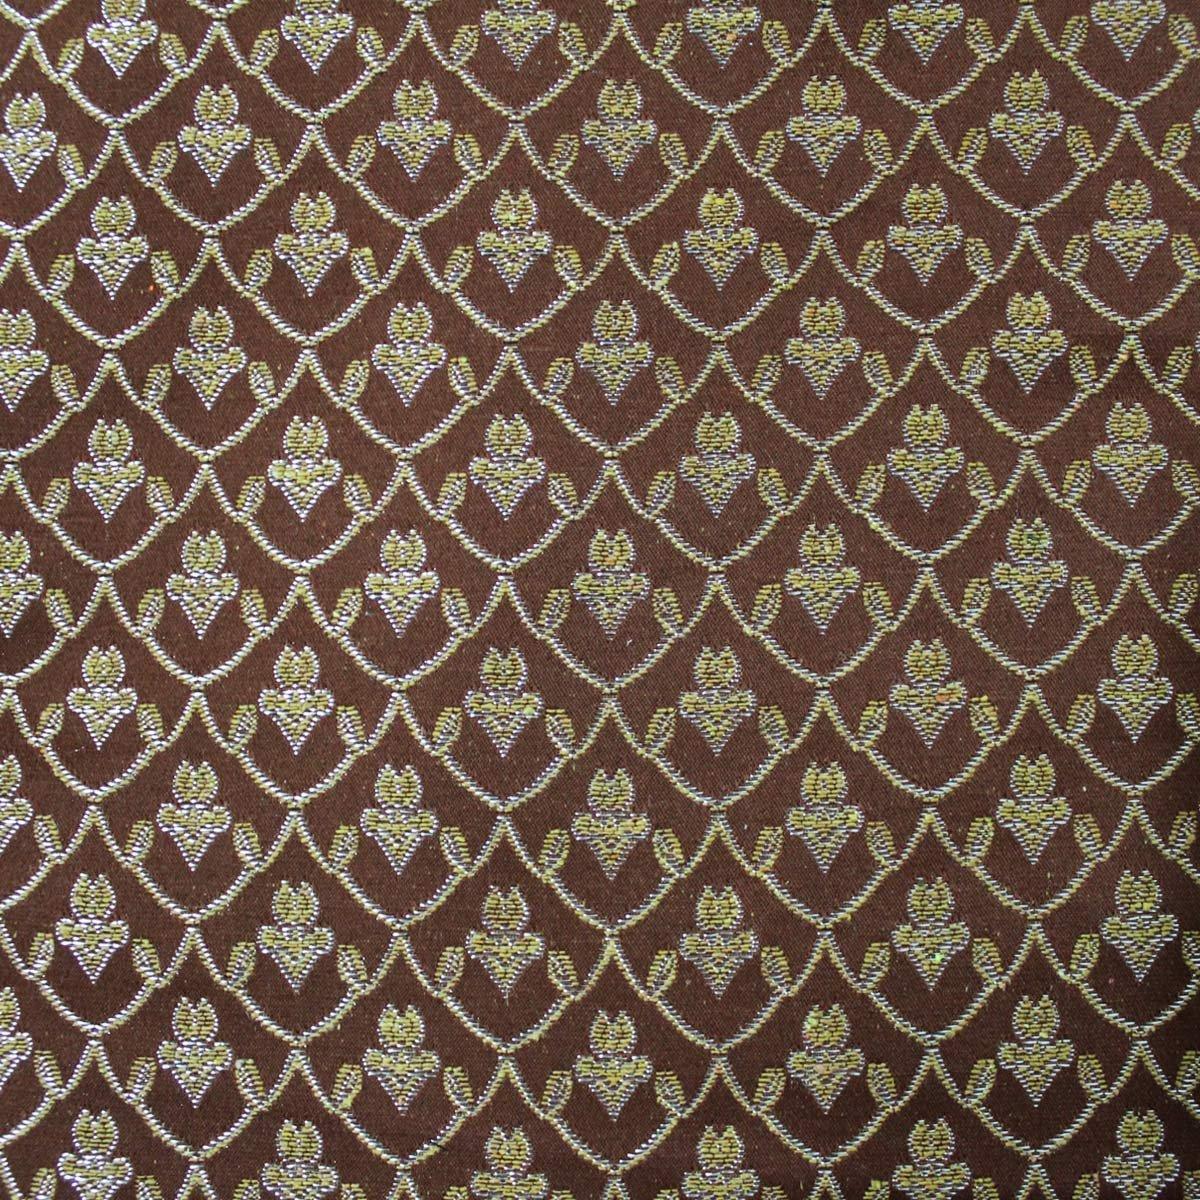 Russo Tessuti Tessuto Tappezzeria Damascato Iris 280 x 280 cm Vari Colori Oro-Marrone